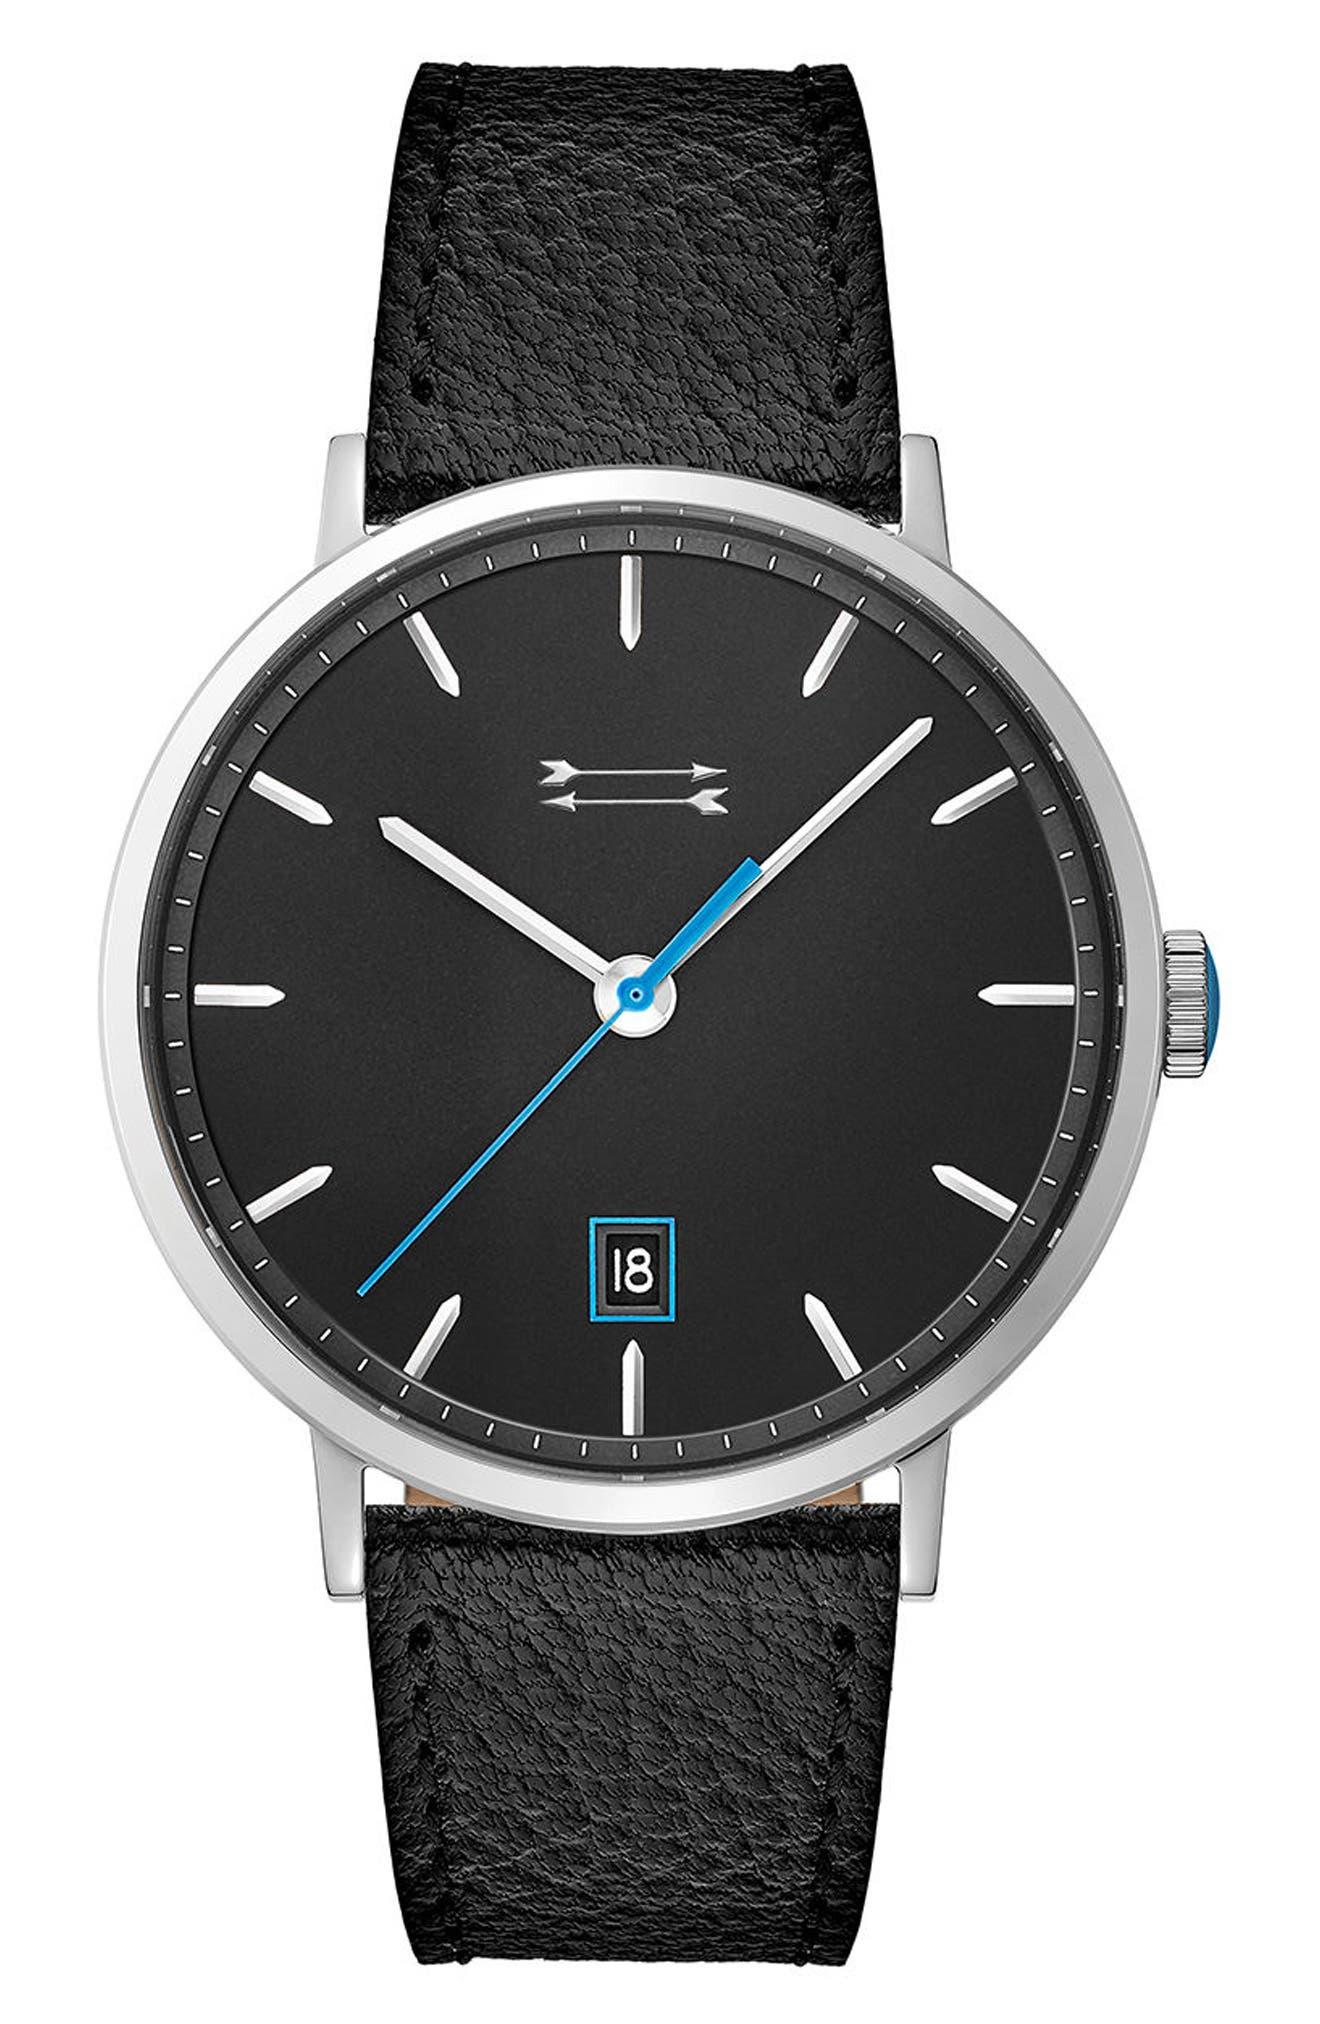 Uri Minkoff Norrebro Leather Strap Watch, 40mm